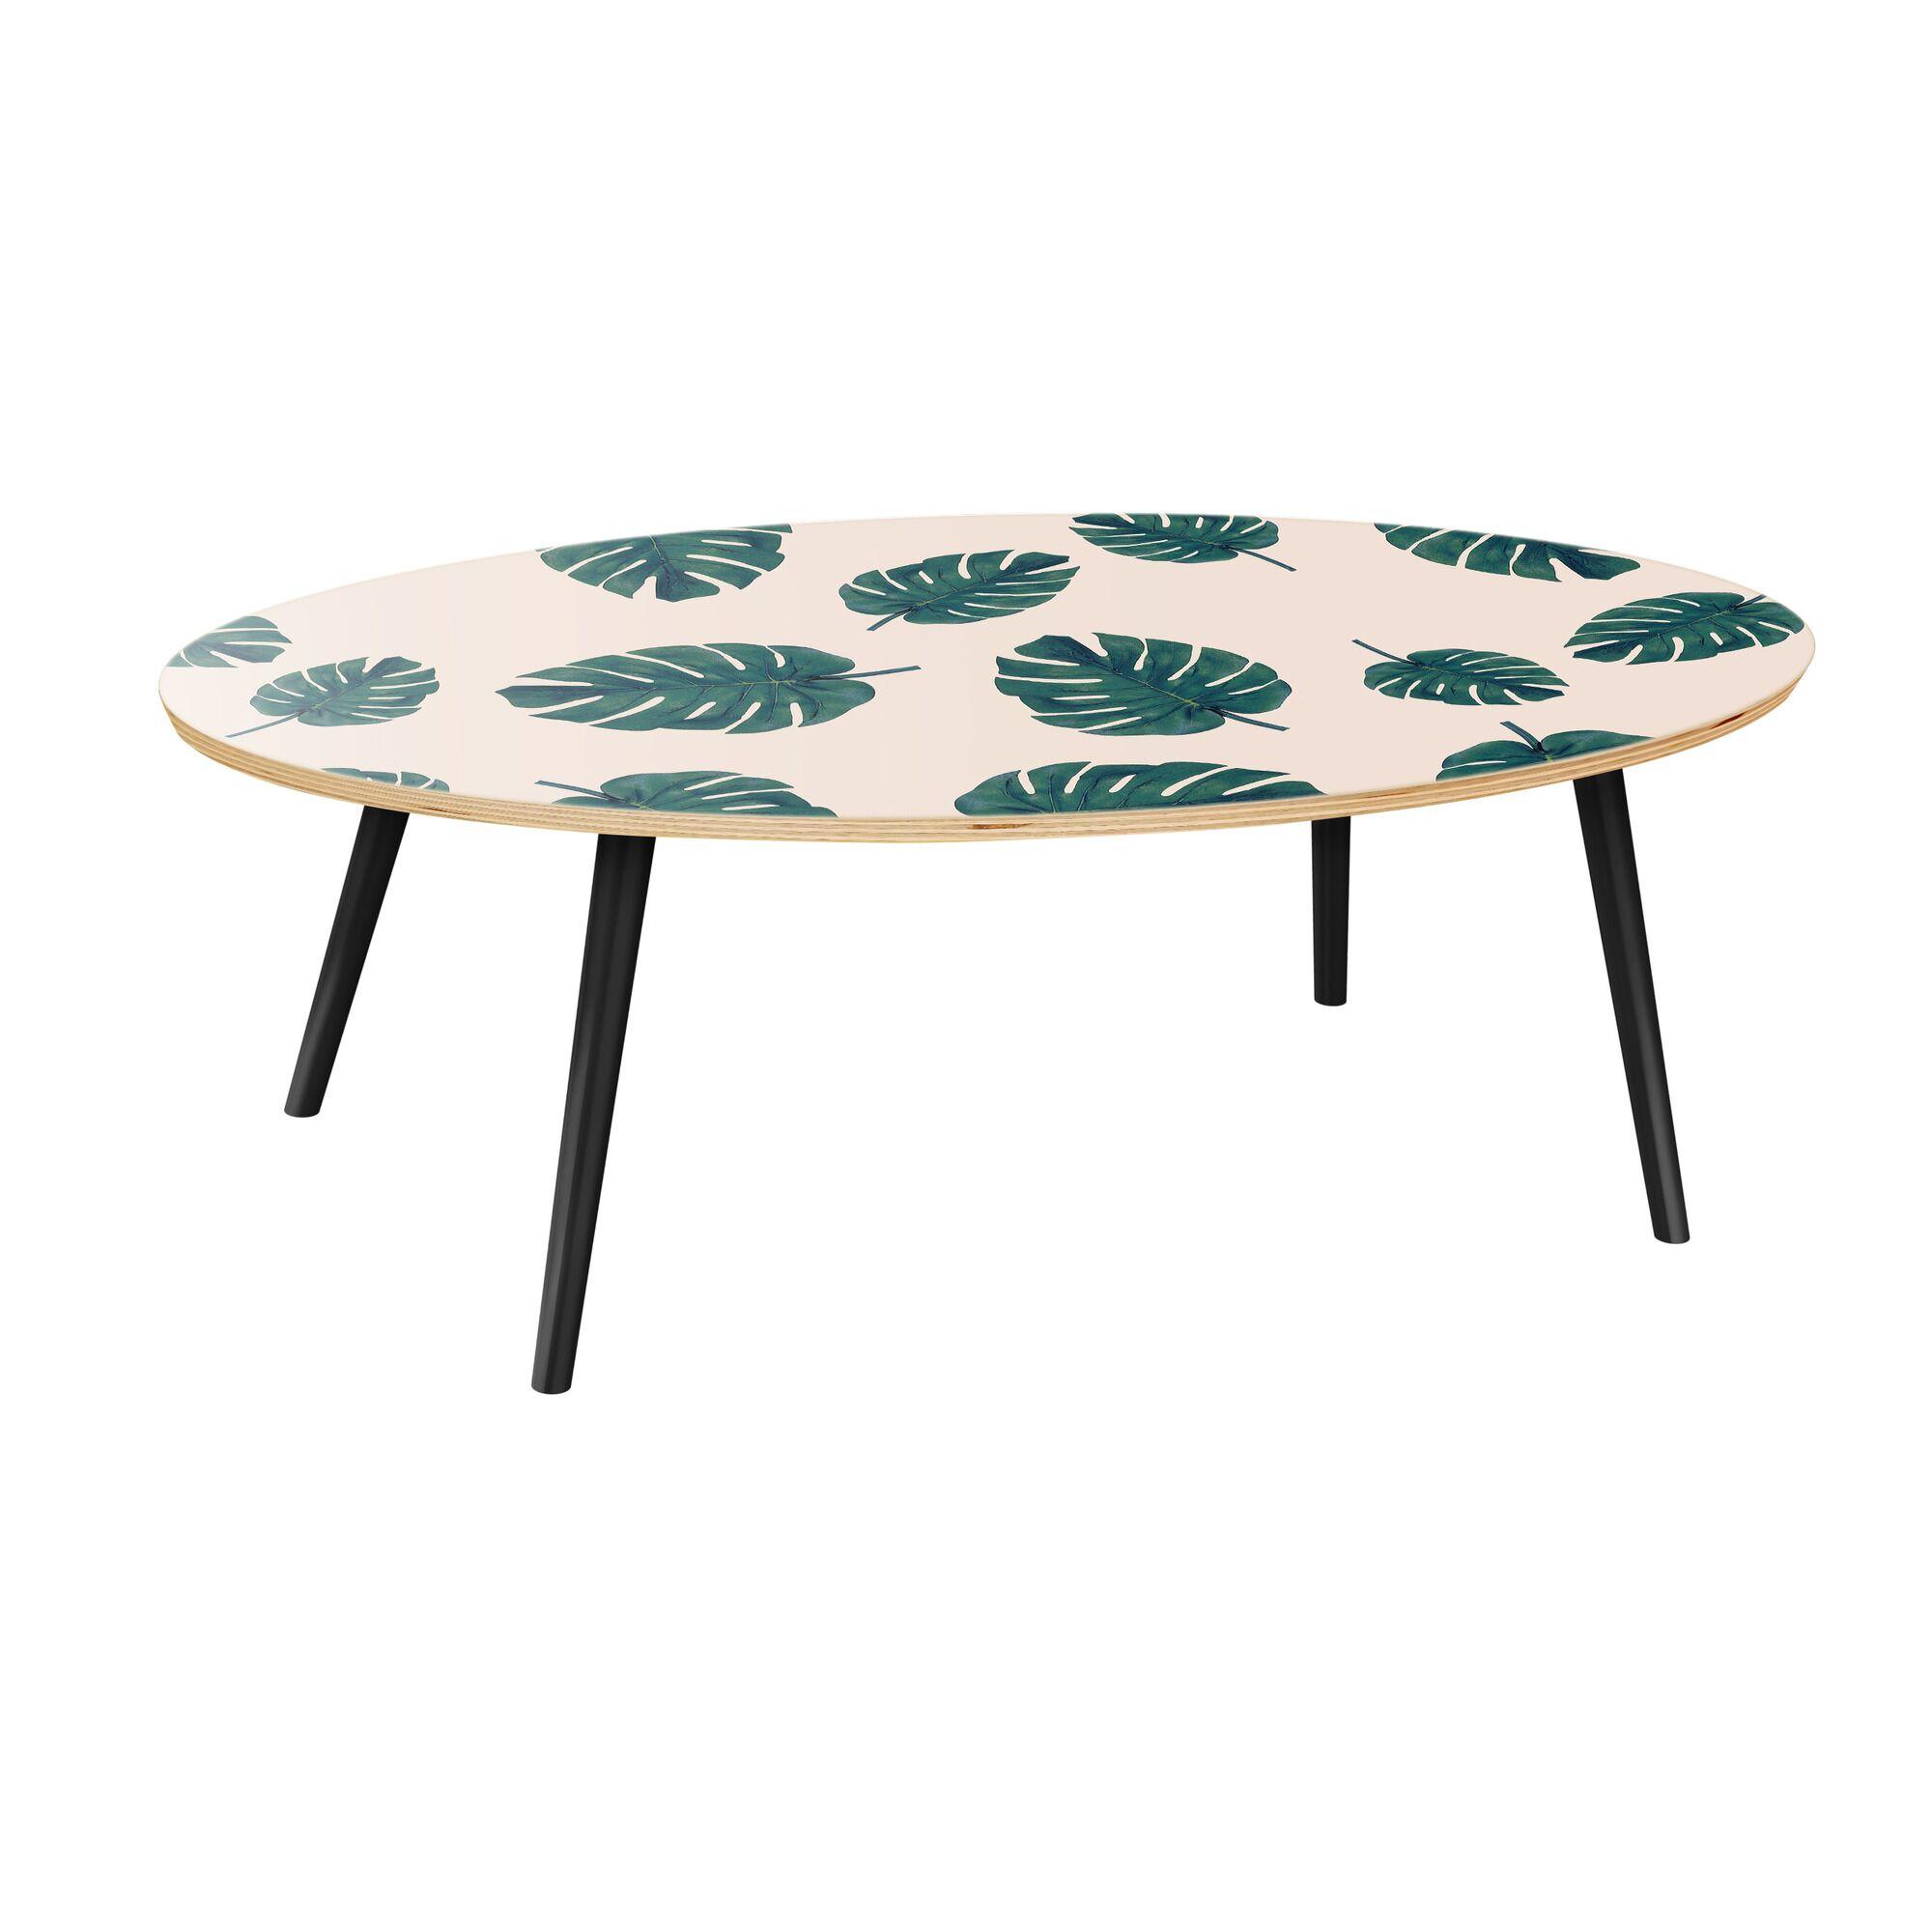 Scheel Coffee Table Table Base Color: Black, Table Top Color: Natural